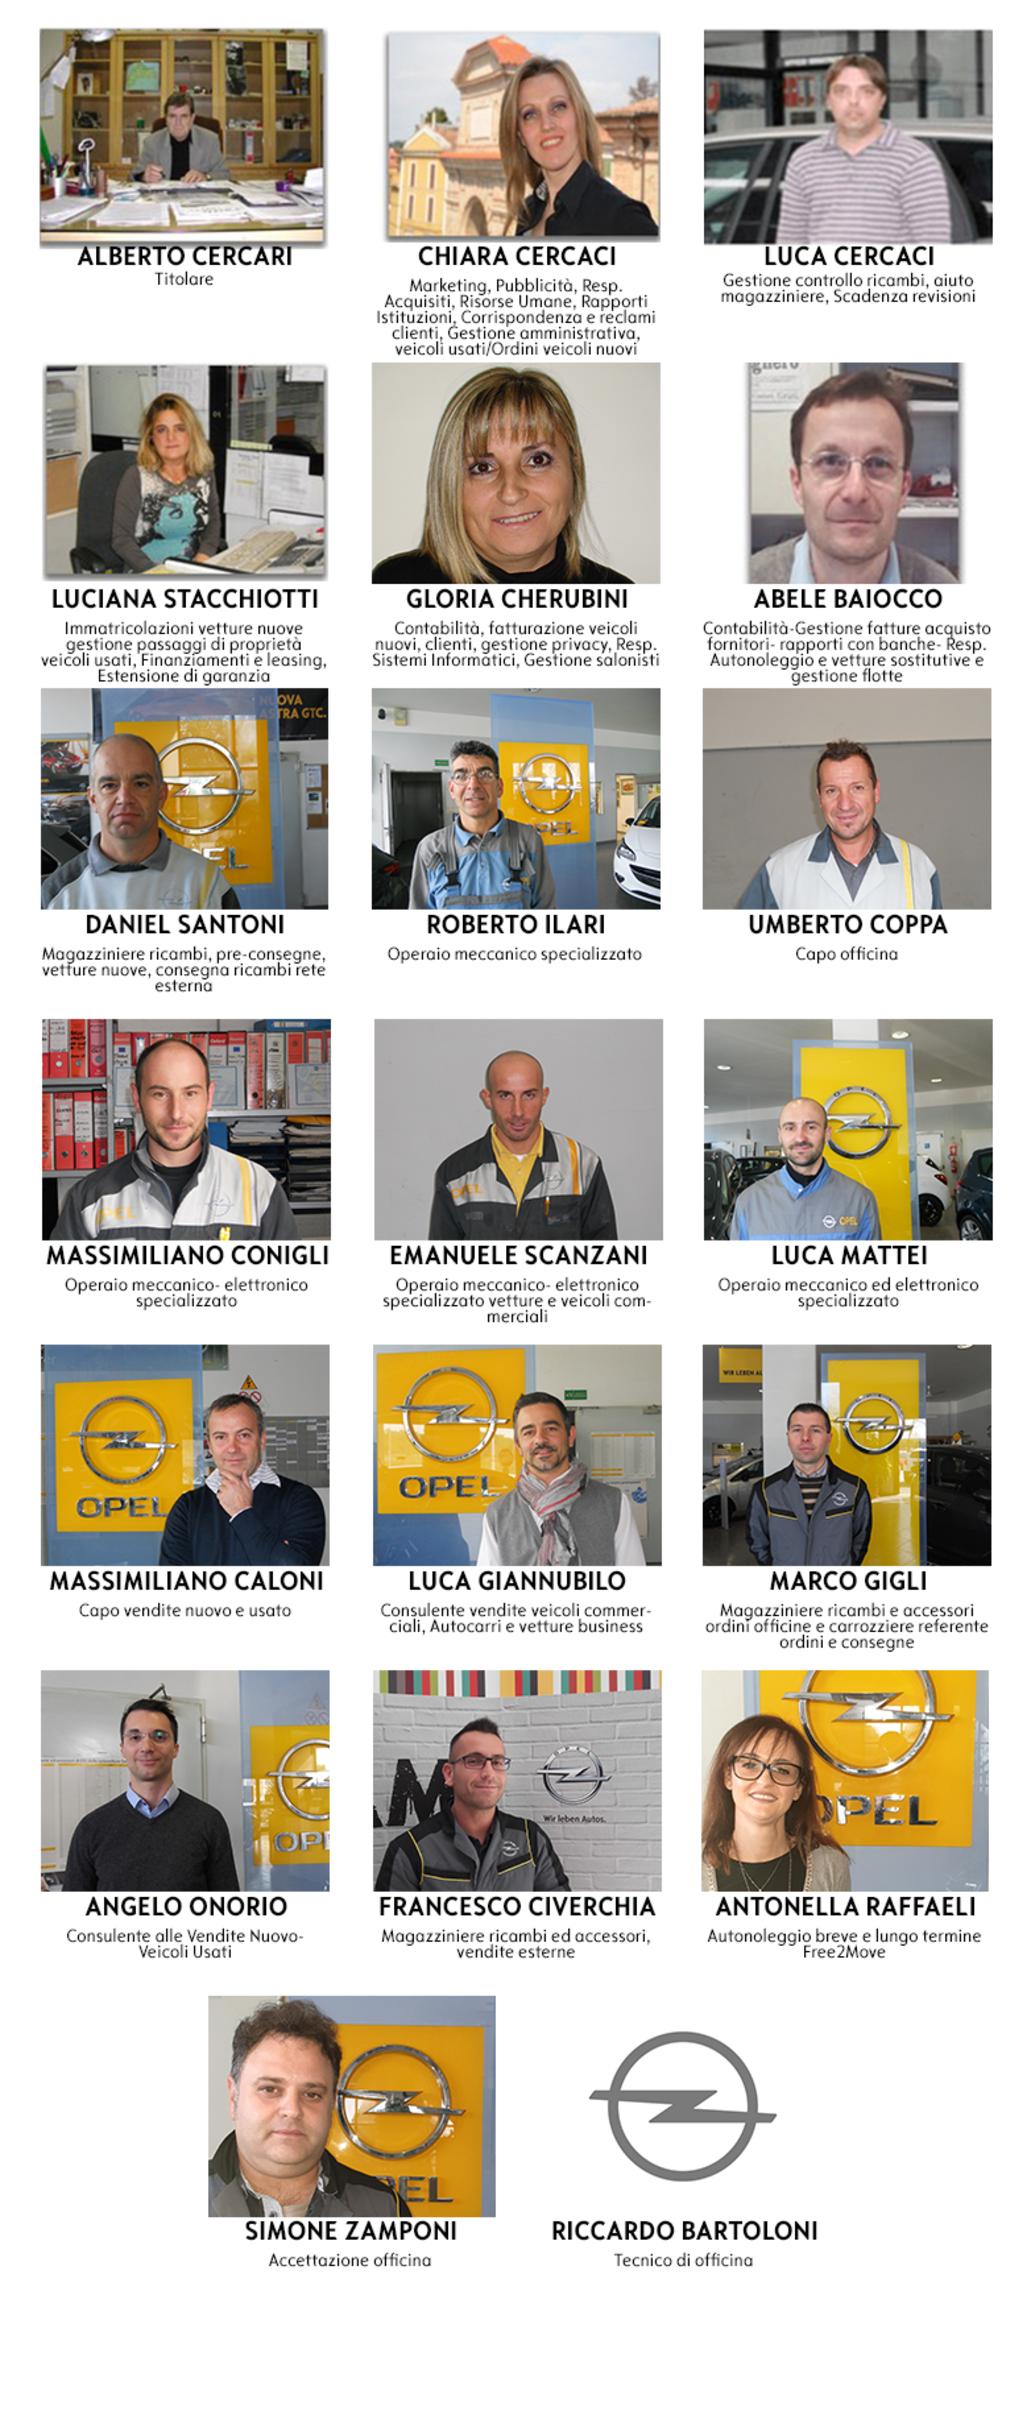 almauto opel staff page